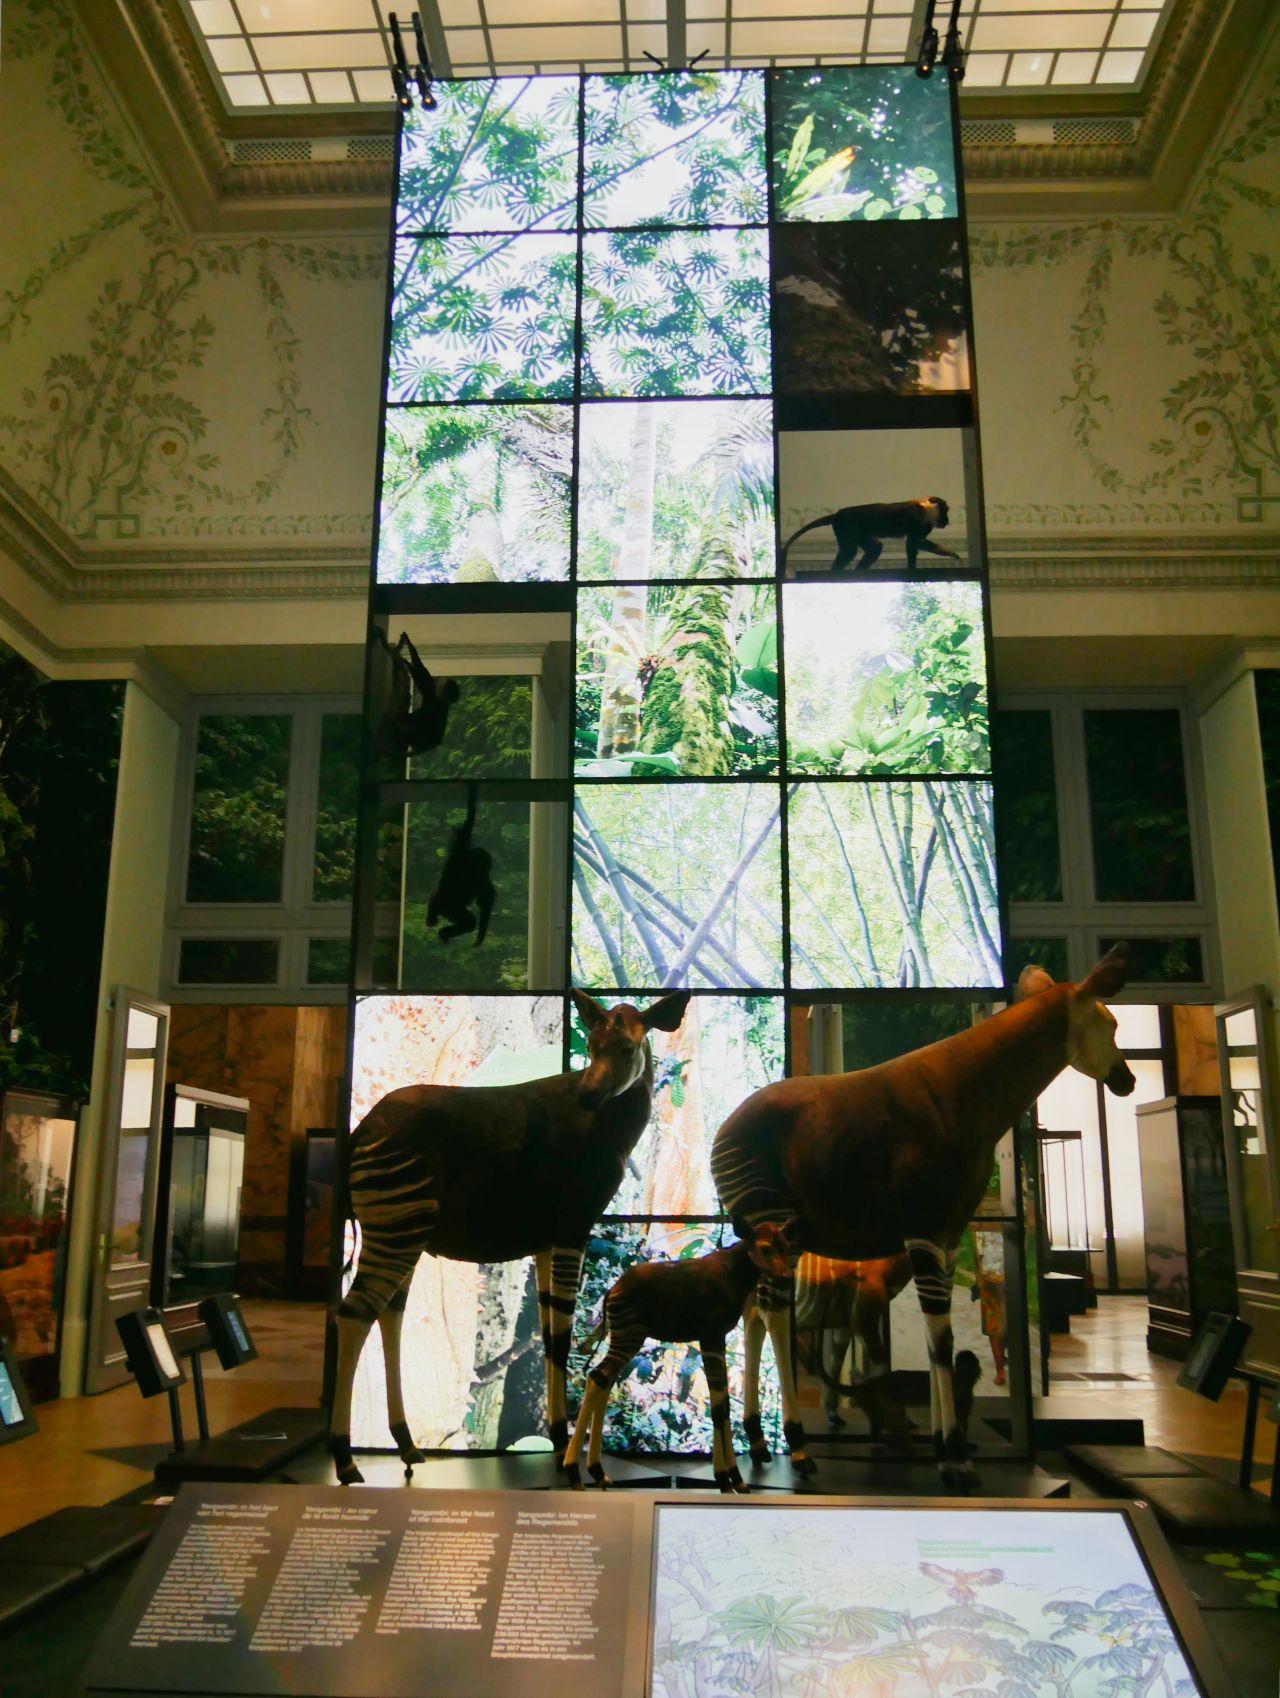 Africamuseum Tervuren Brussel5